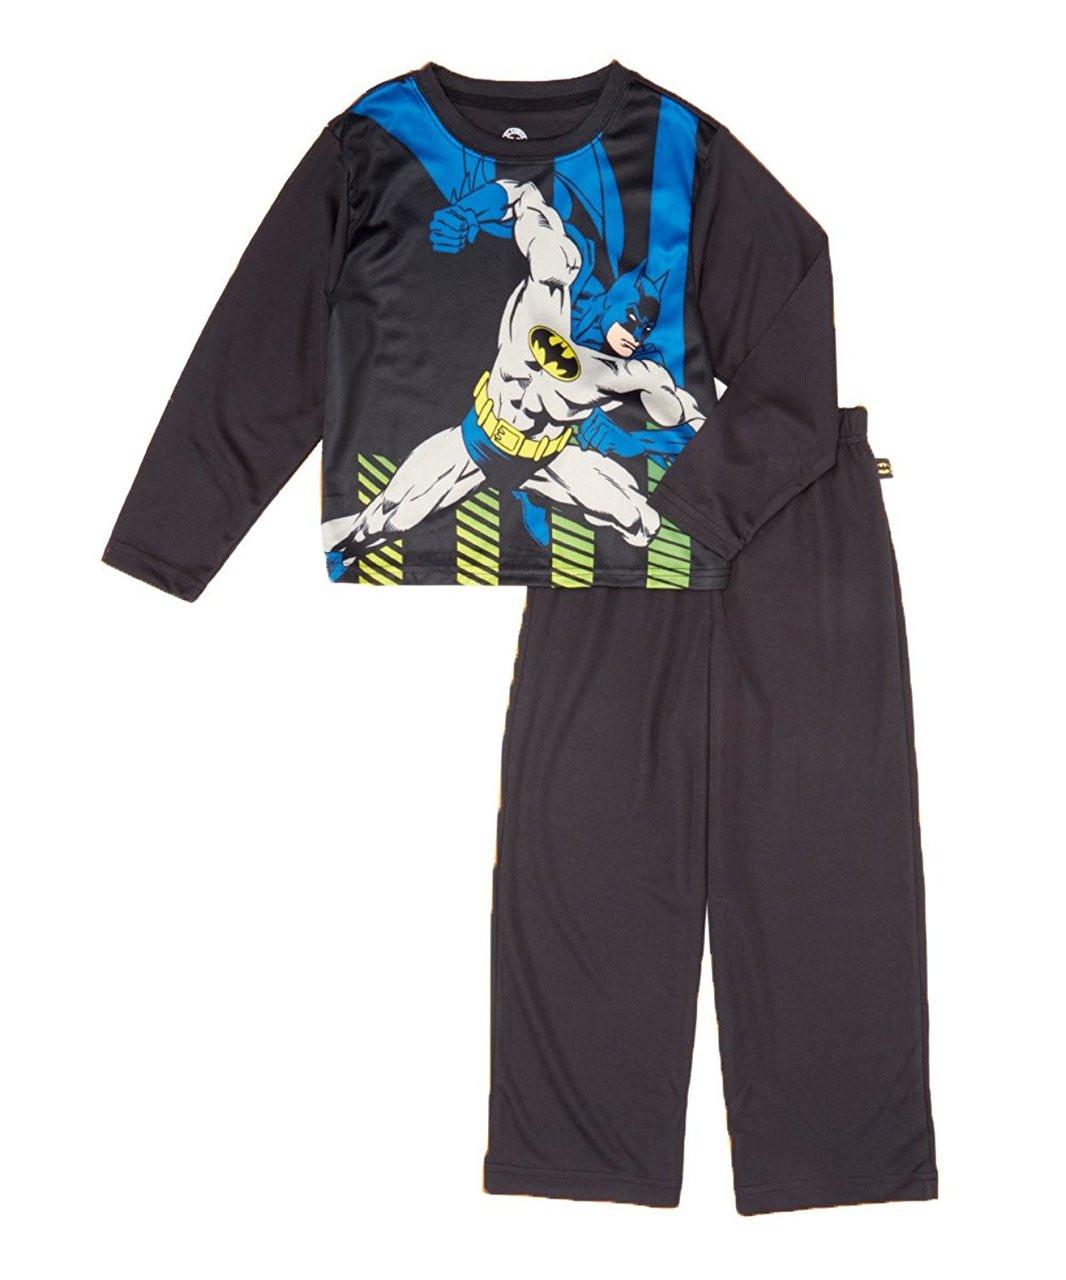 Batman Knock-Out 2-Piece Pajama Set a943f3c47